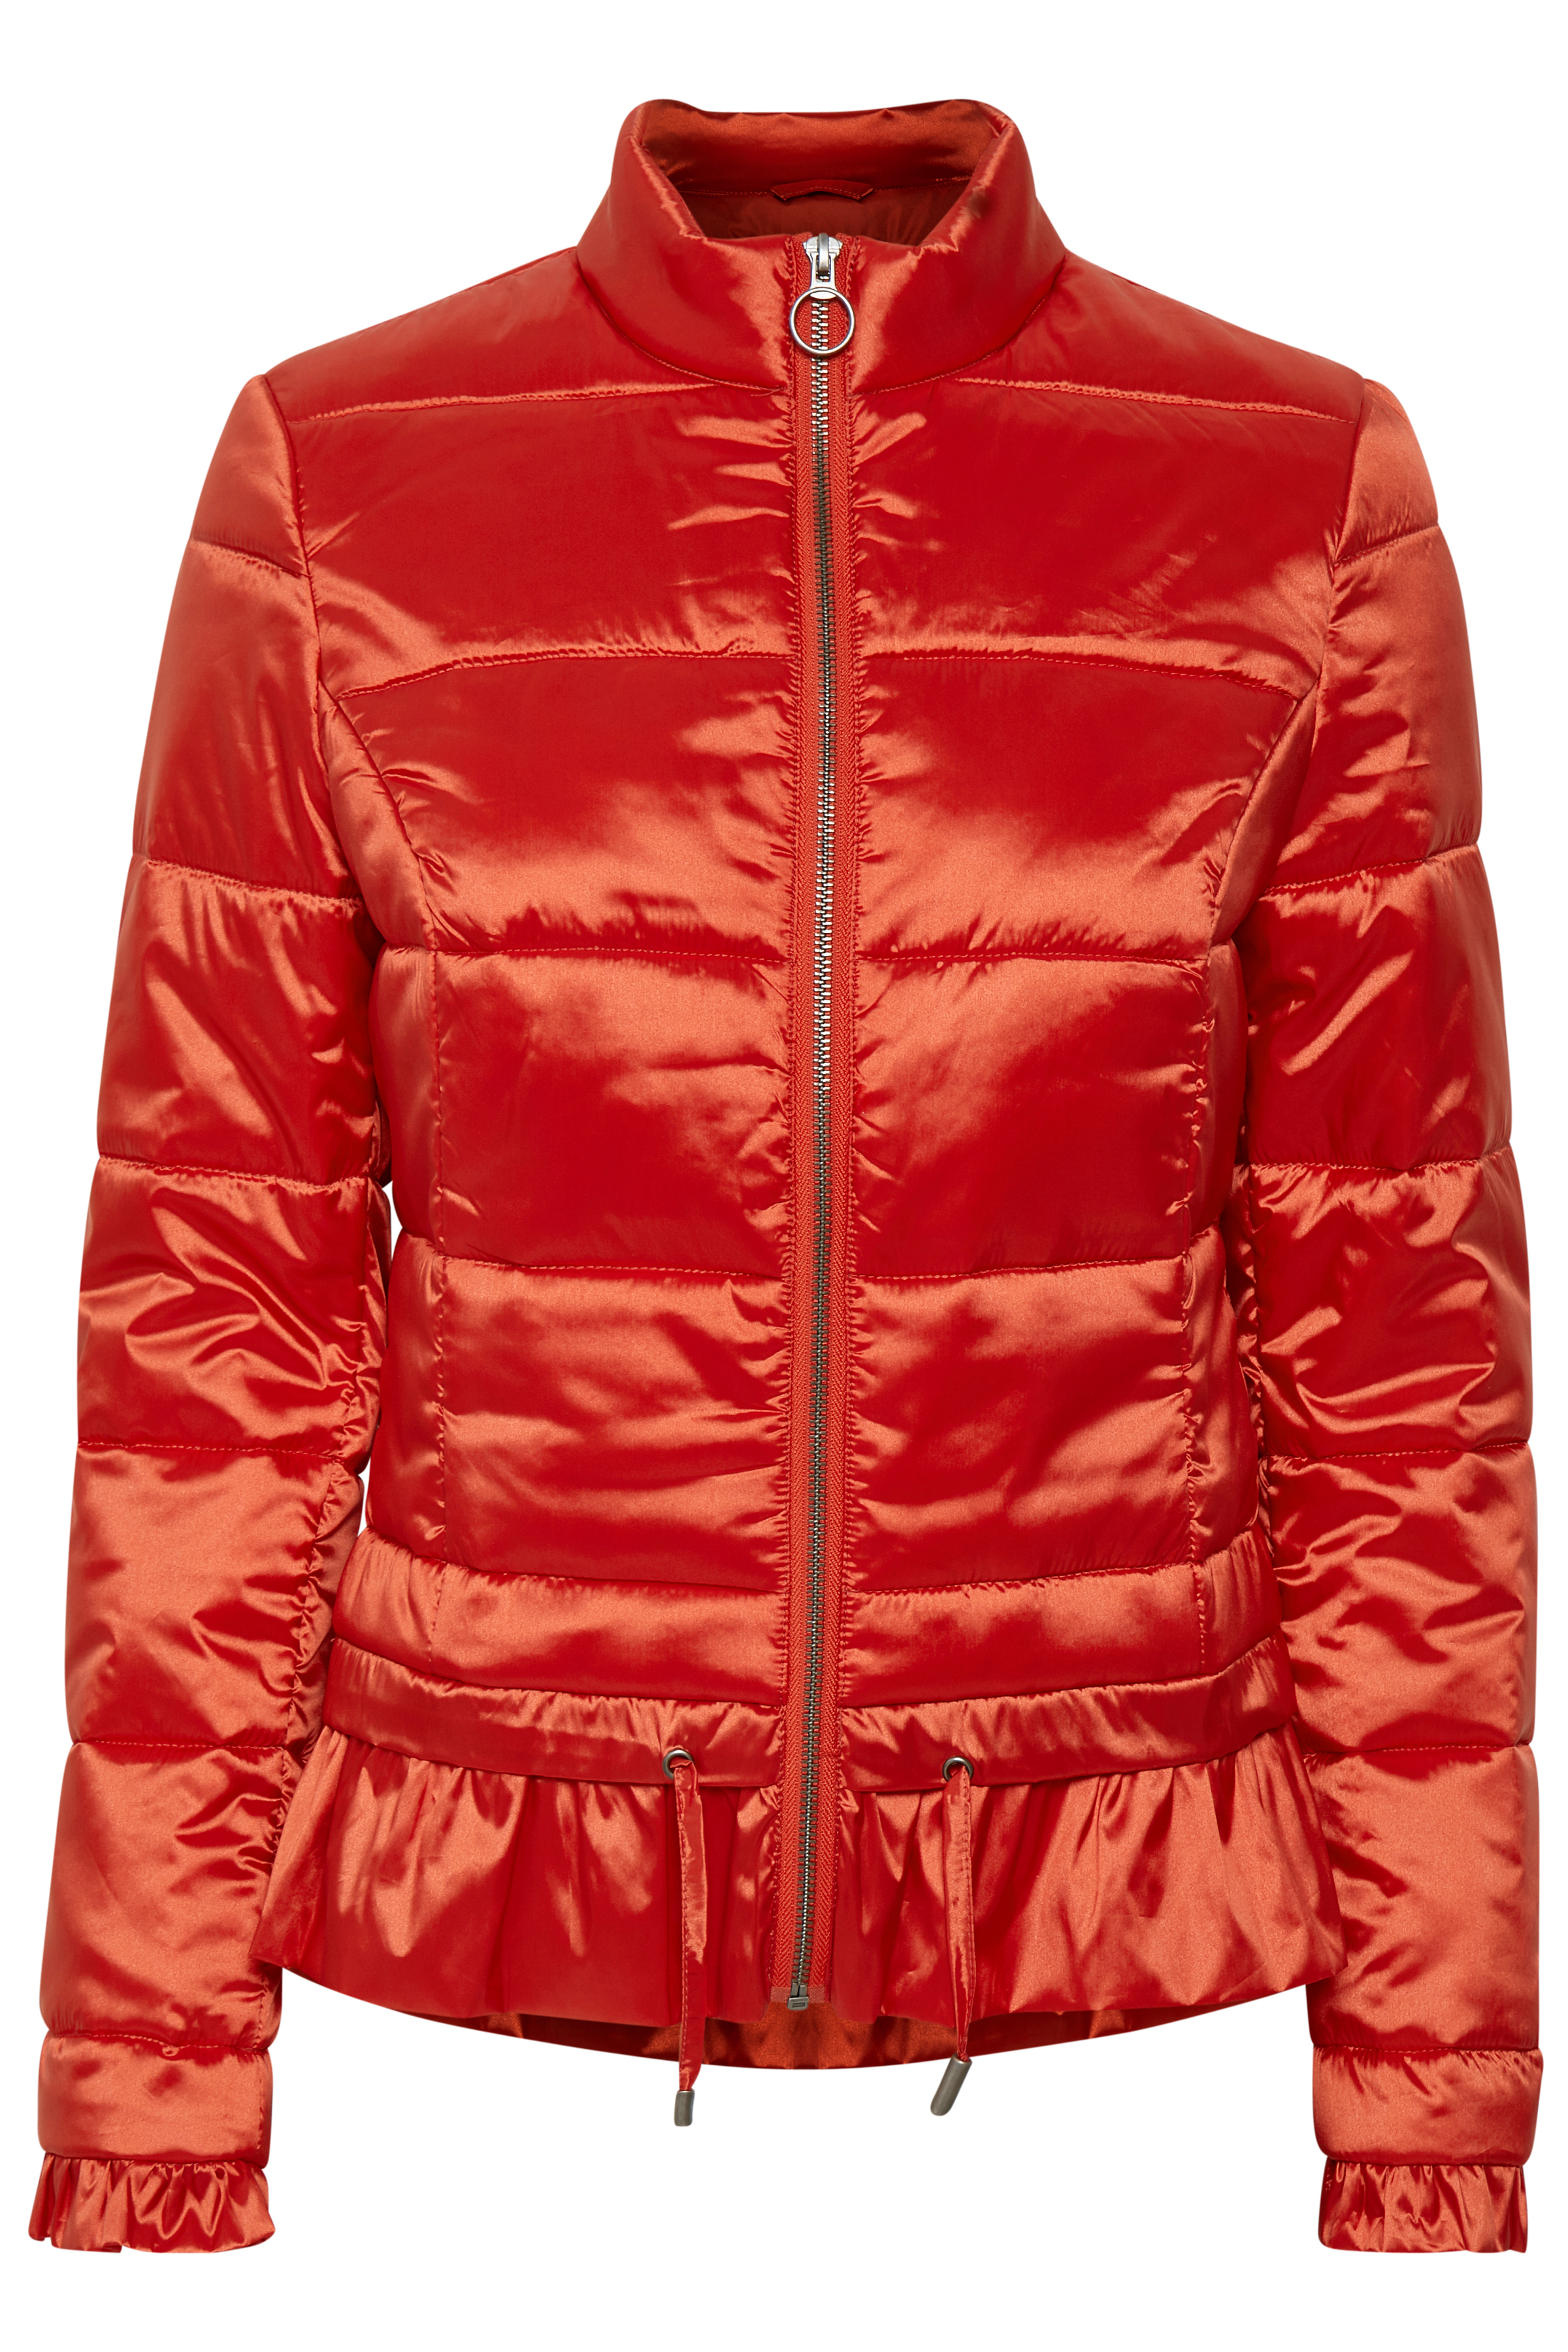 Rød Frakke fra Cream – Køb Rød Frakke fra str. 34-46 her